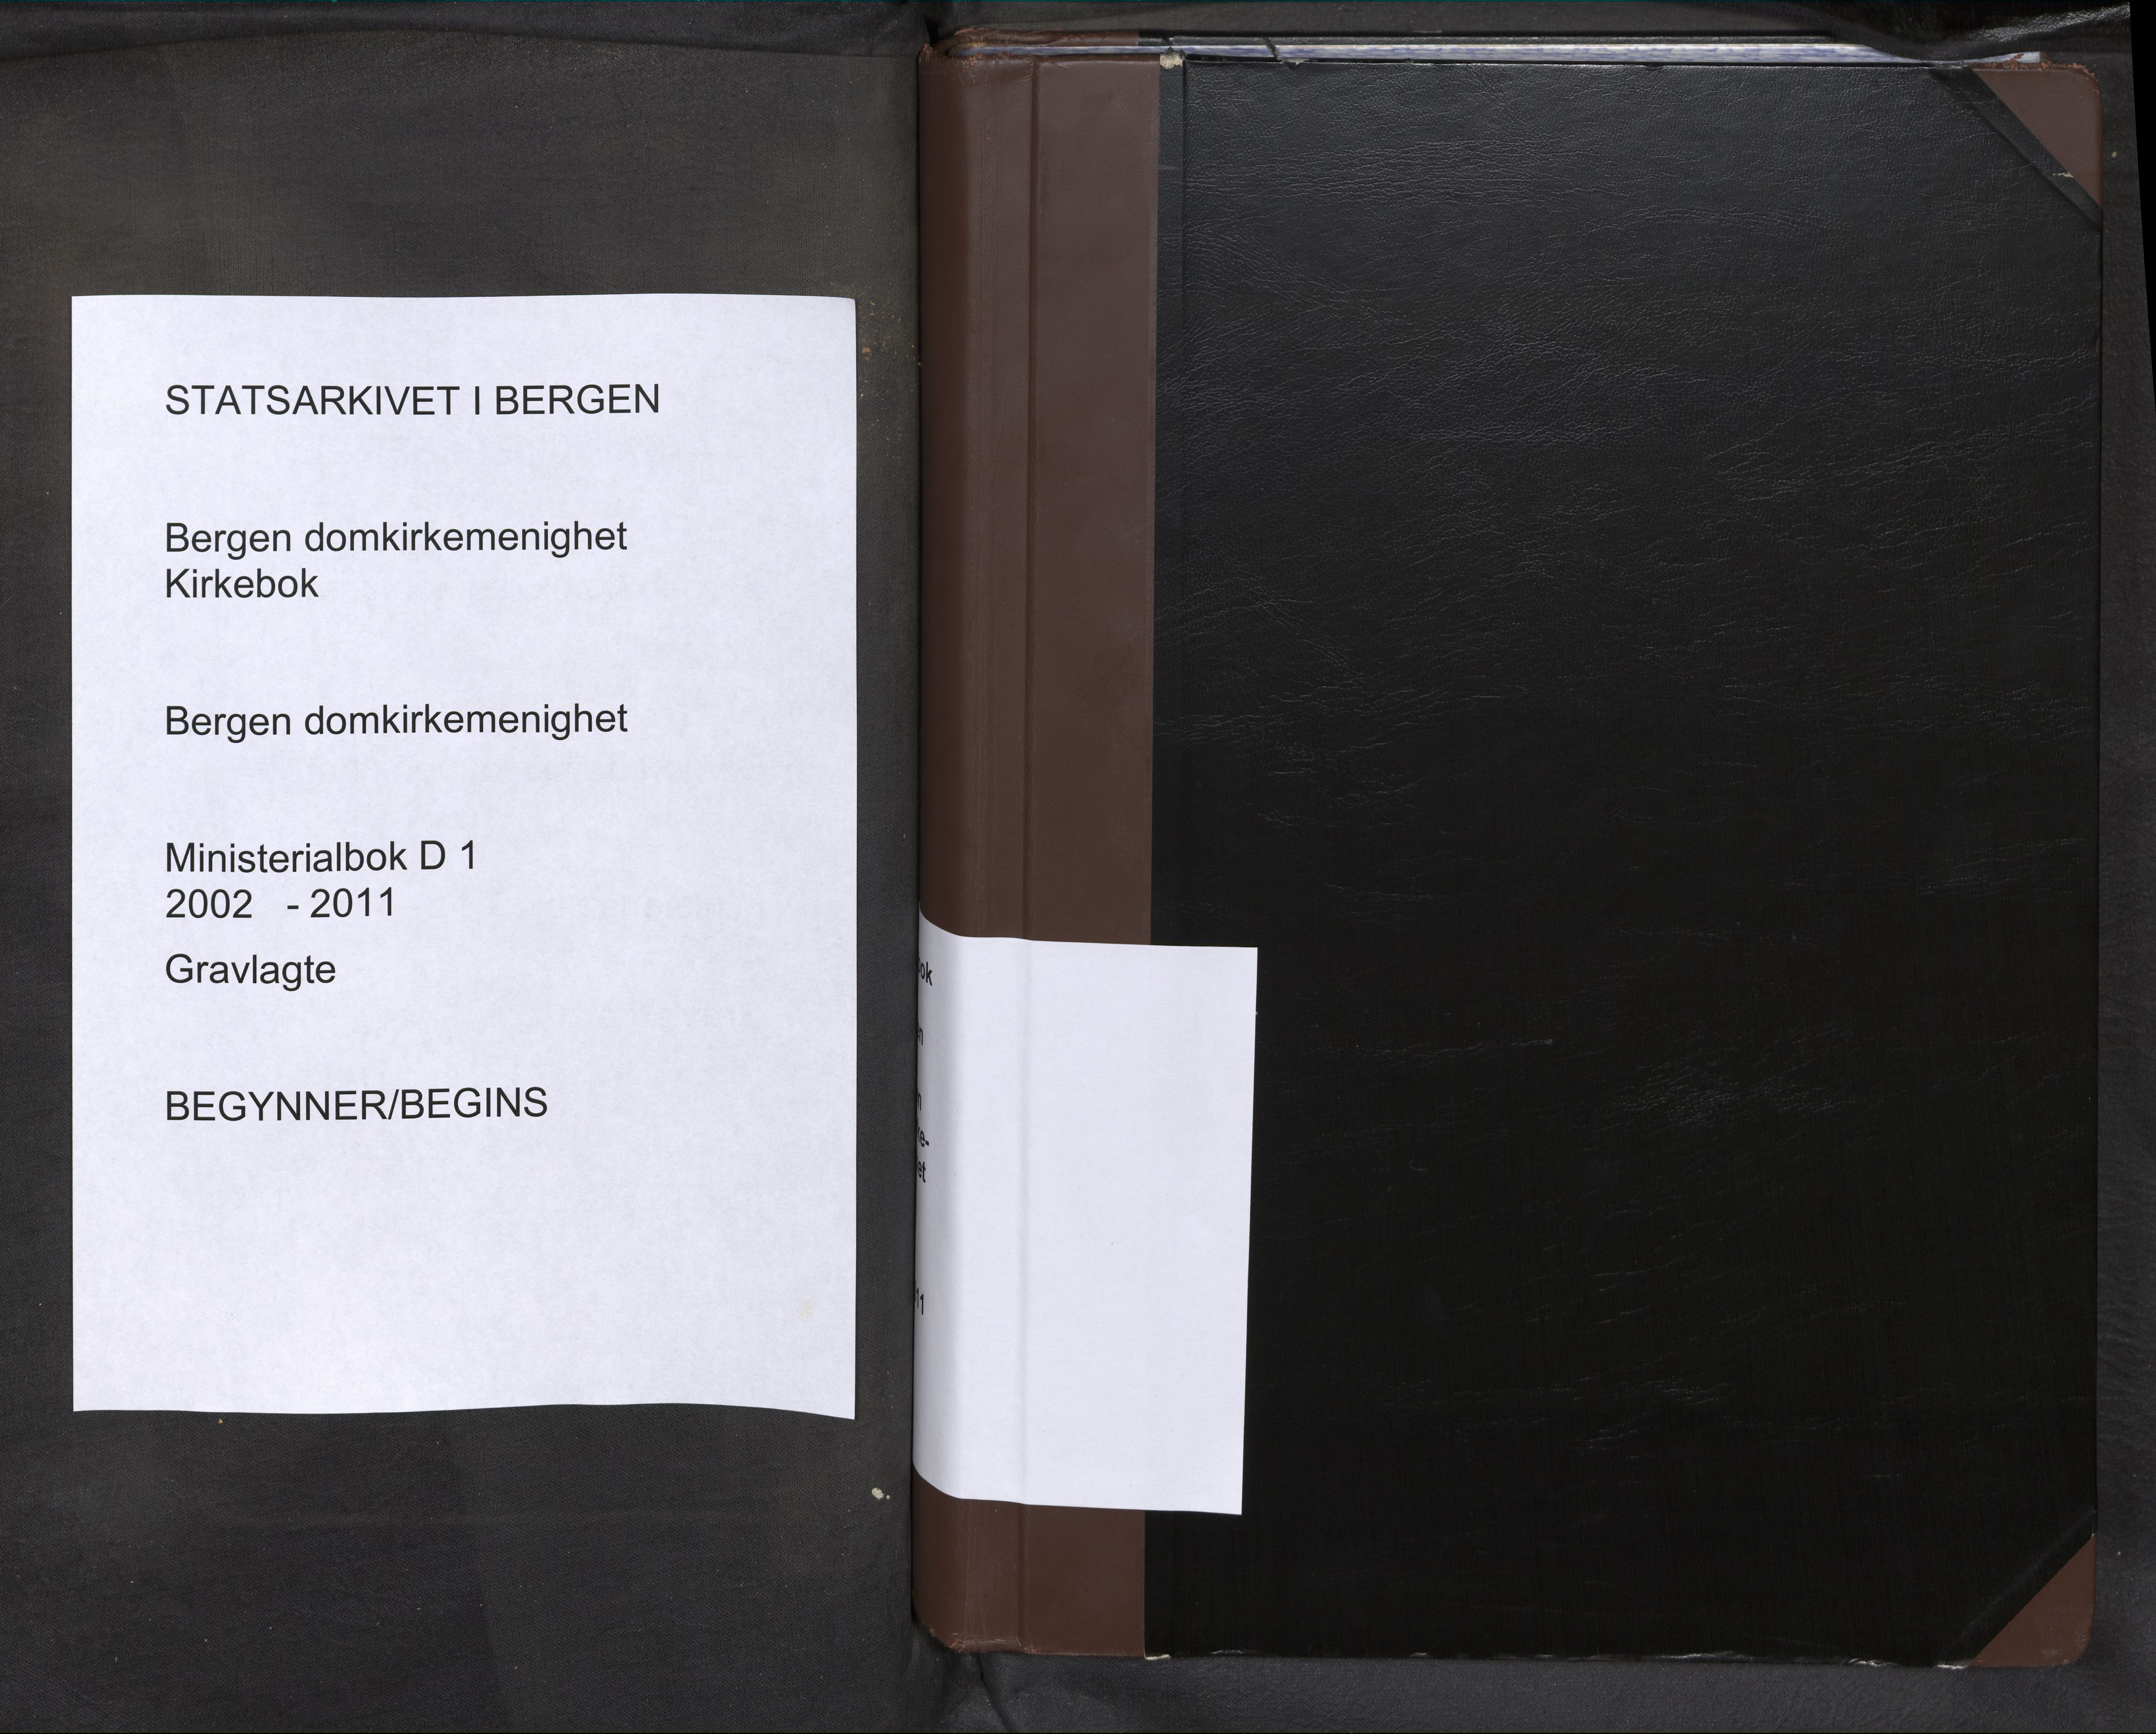 SAB, Domkirken Sokneprestembete, H/Haa: Ministerialbok nr. D 1, 2002-2011